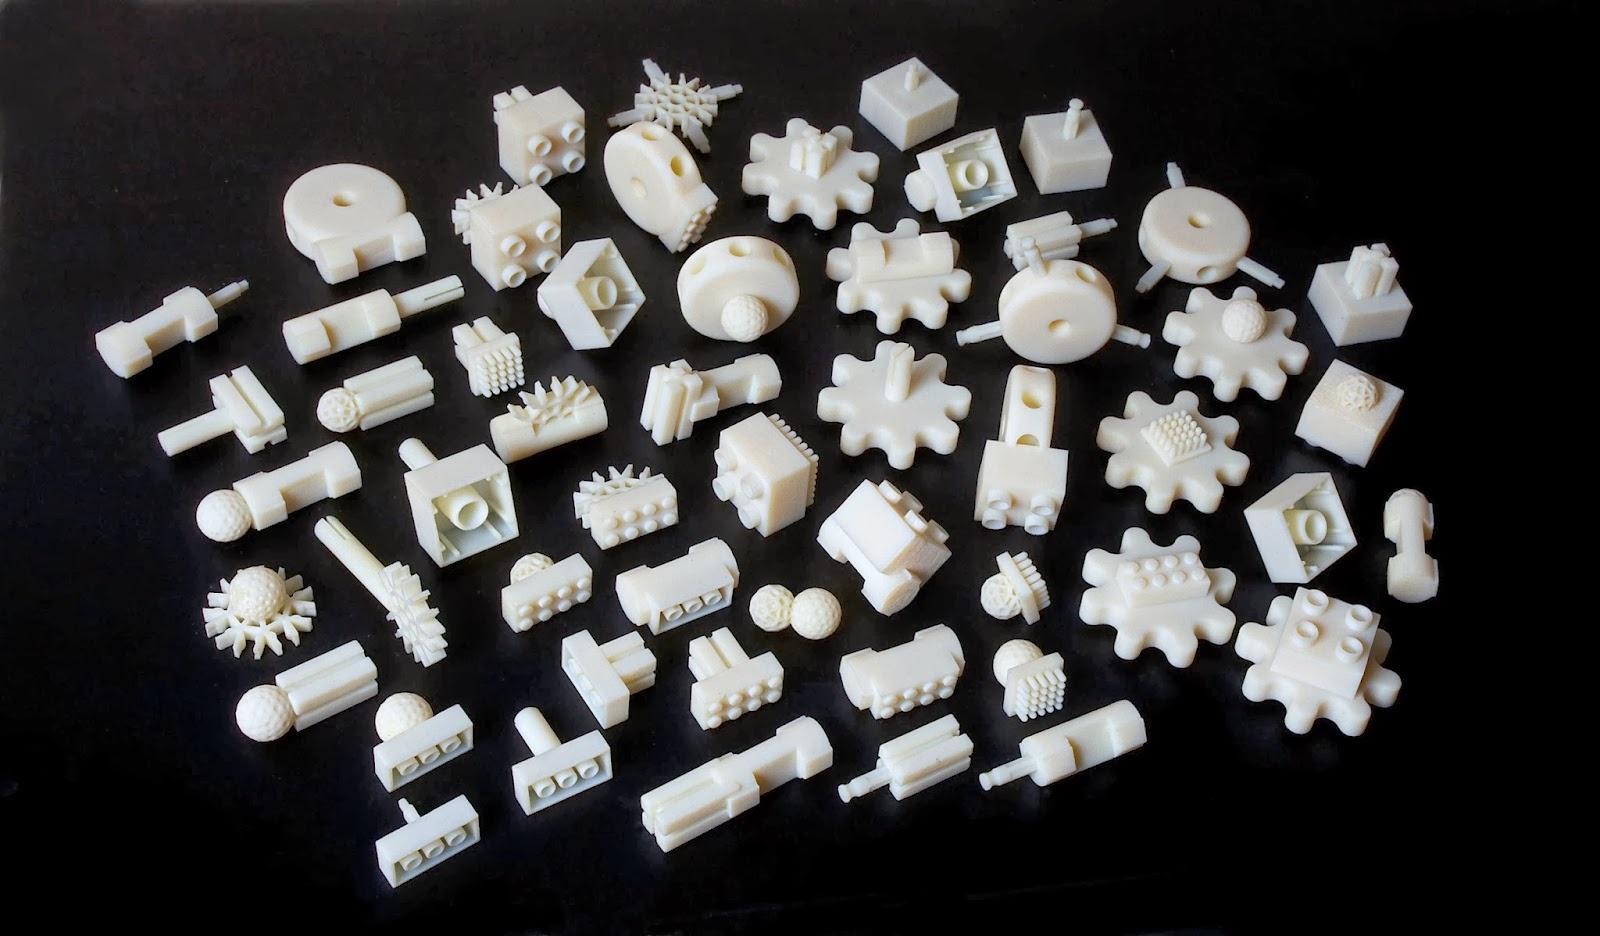 Best Free 3D Printer Stuff: Best Free 3D Printer Models - Free 3D Printable Models